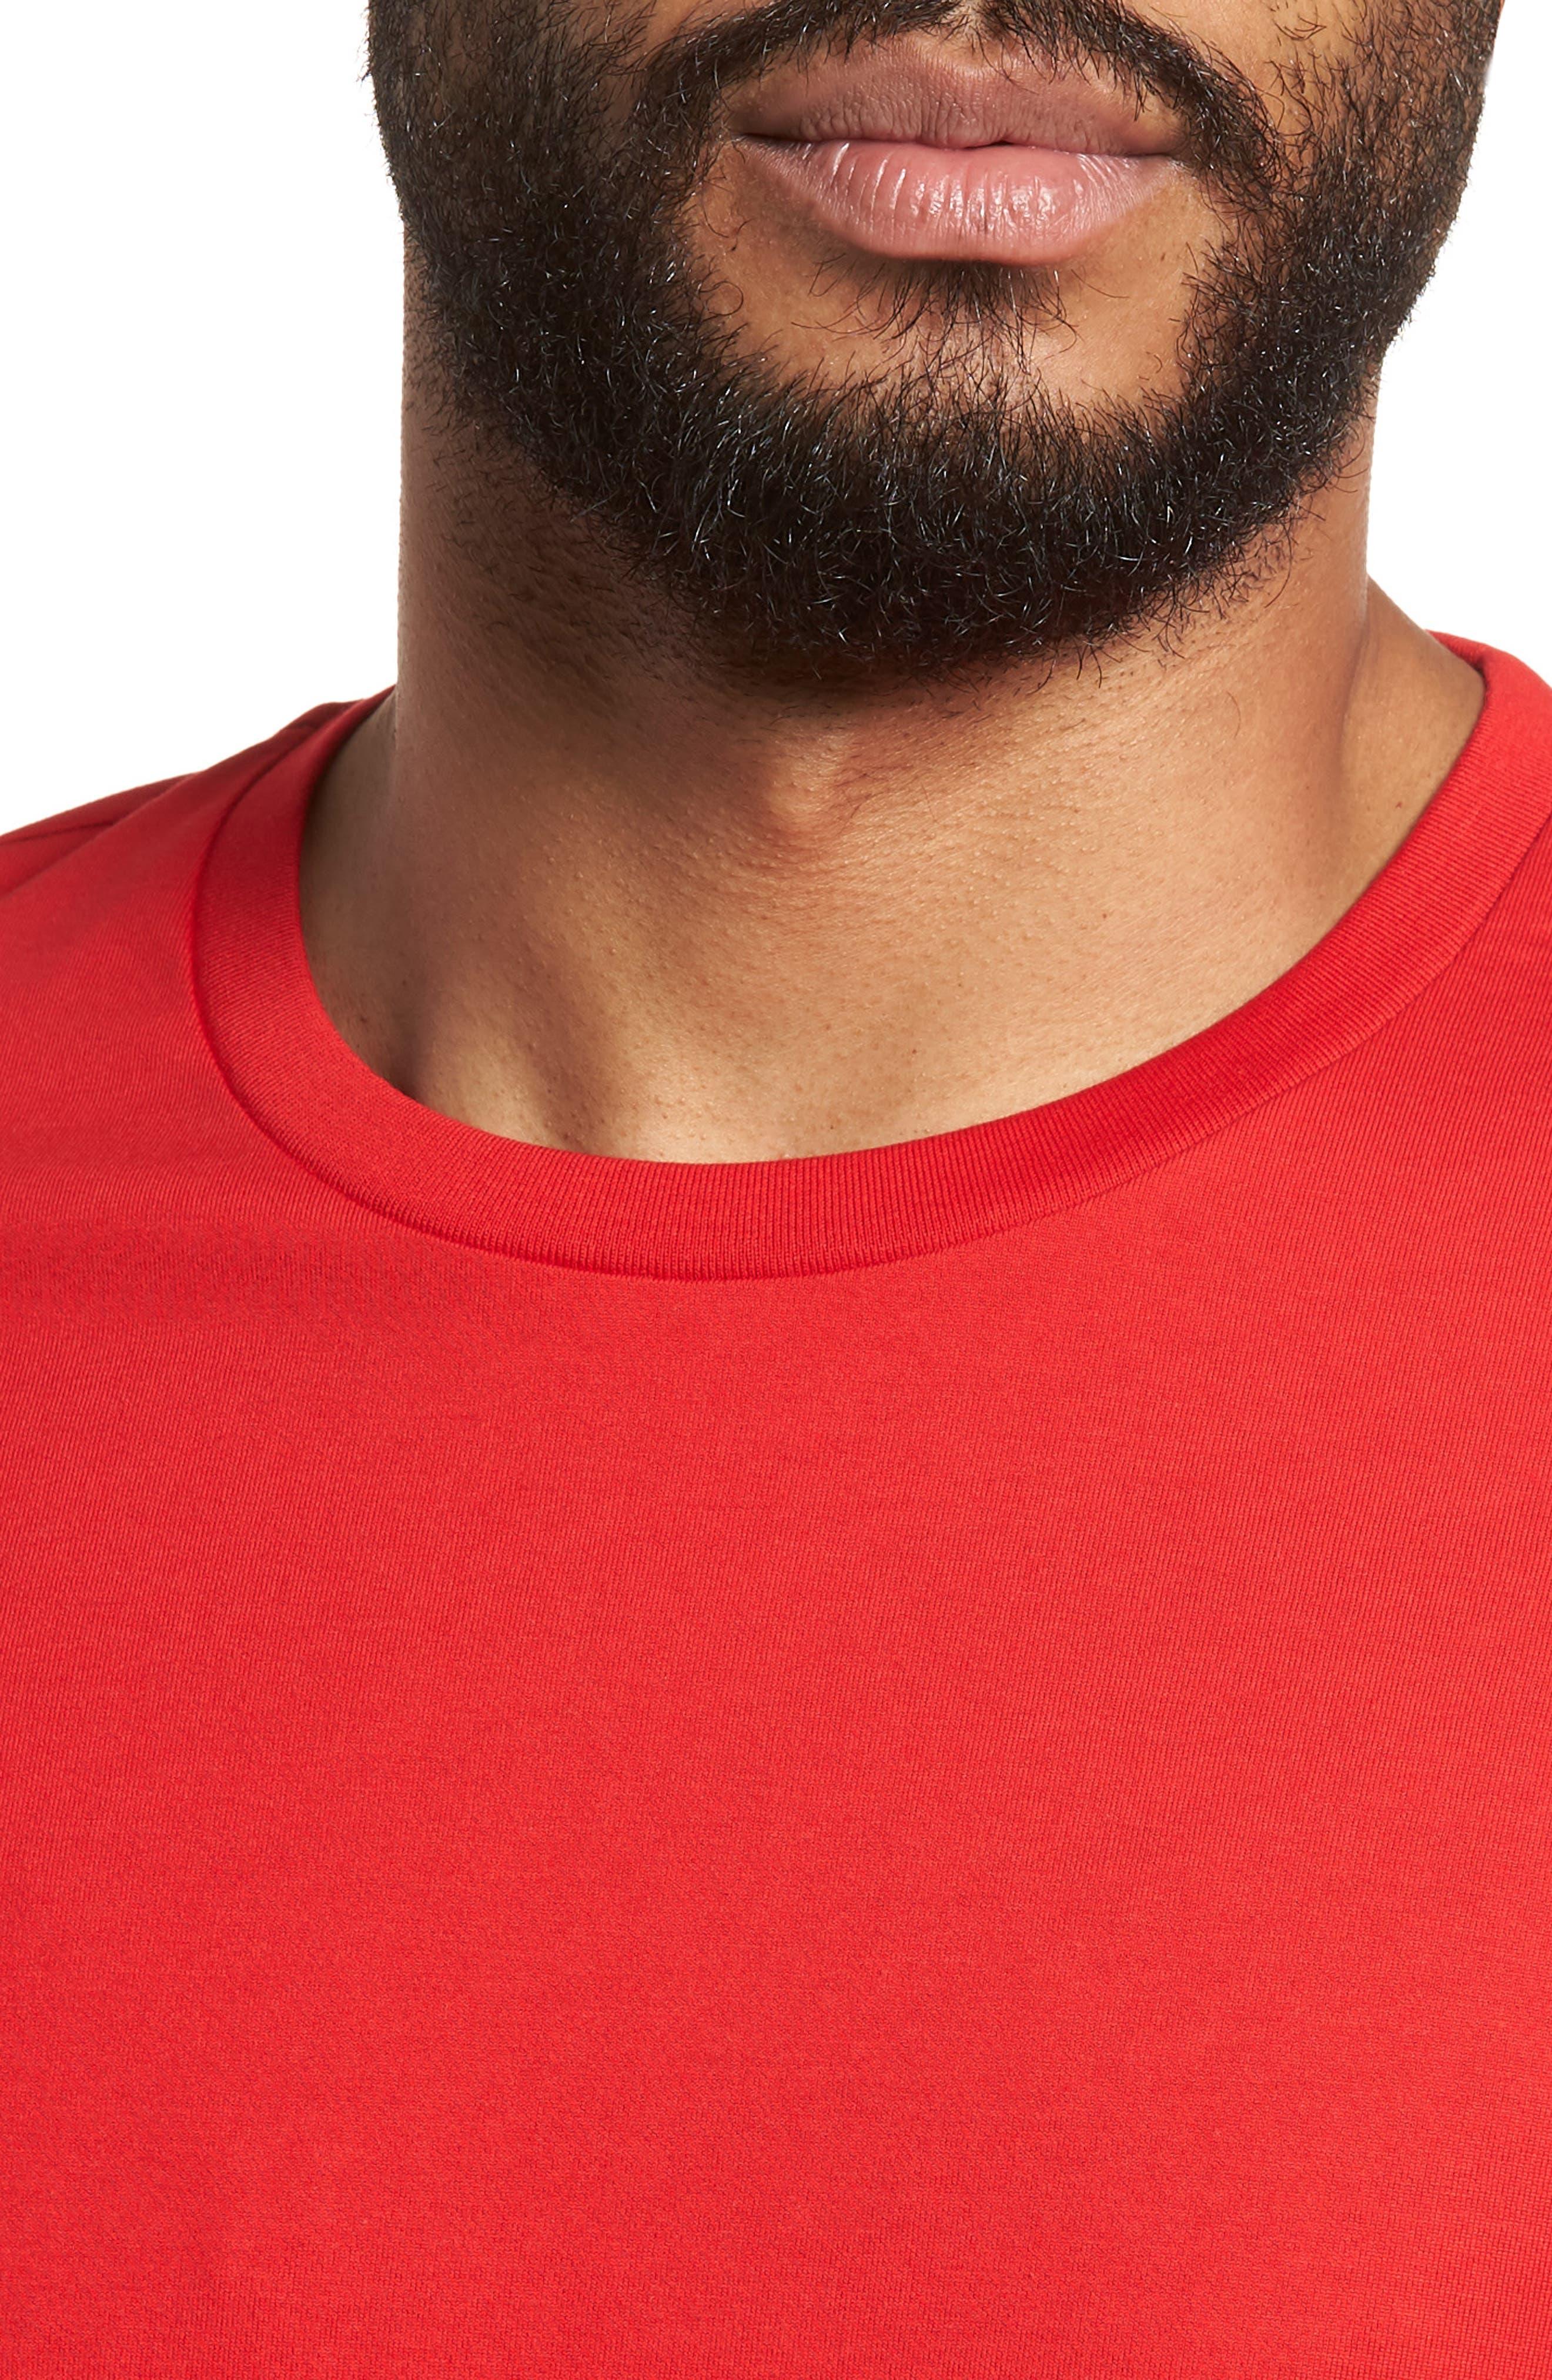 Tiburt Colorblock T-Shirt,                             Alternate thumbnail 8, color,